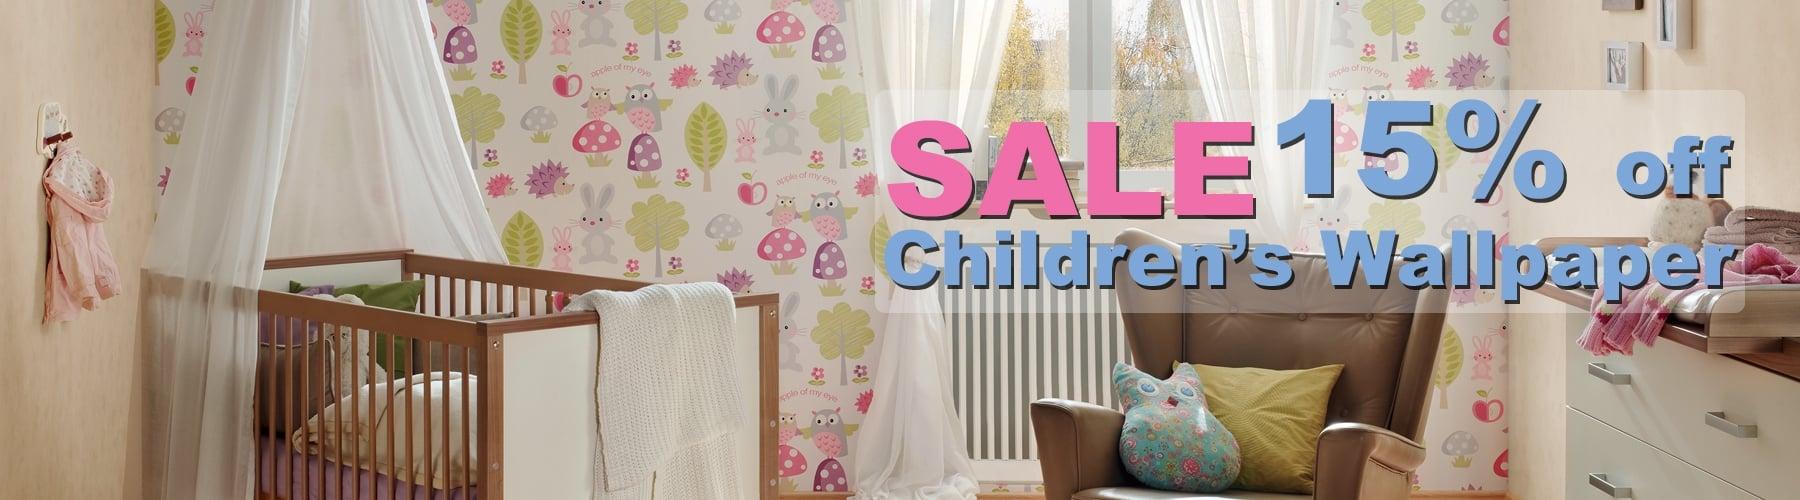 Childrens Wallpaper Sale